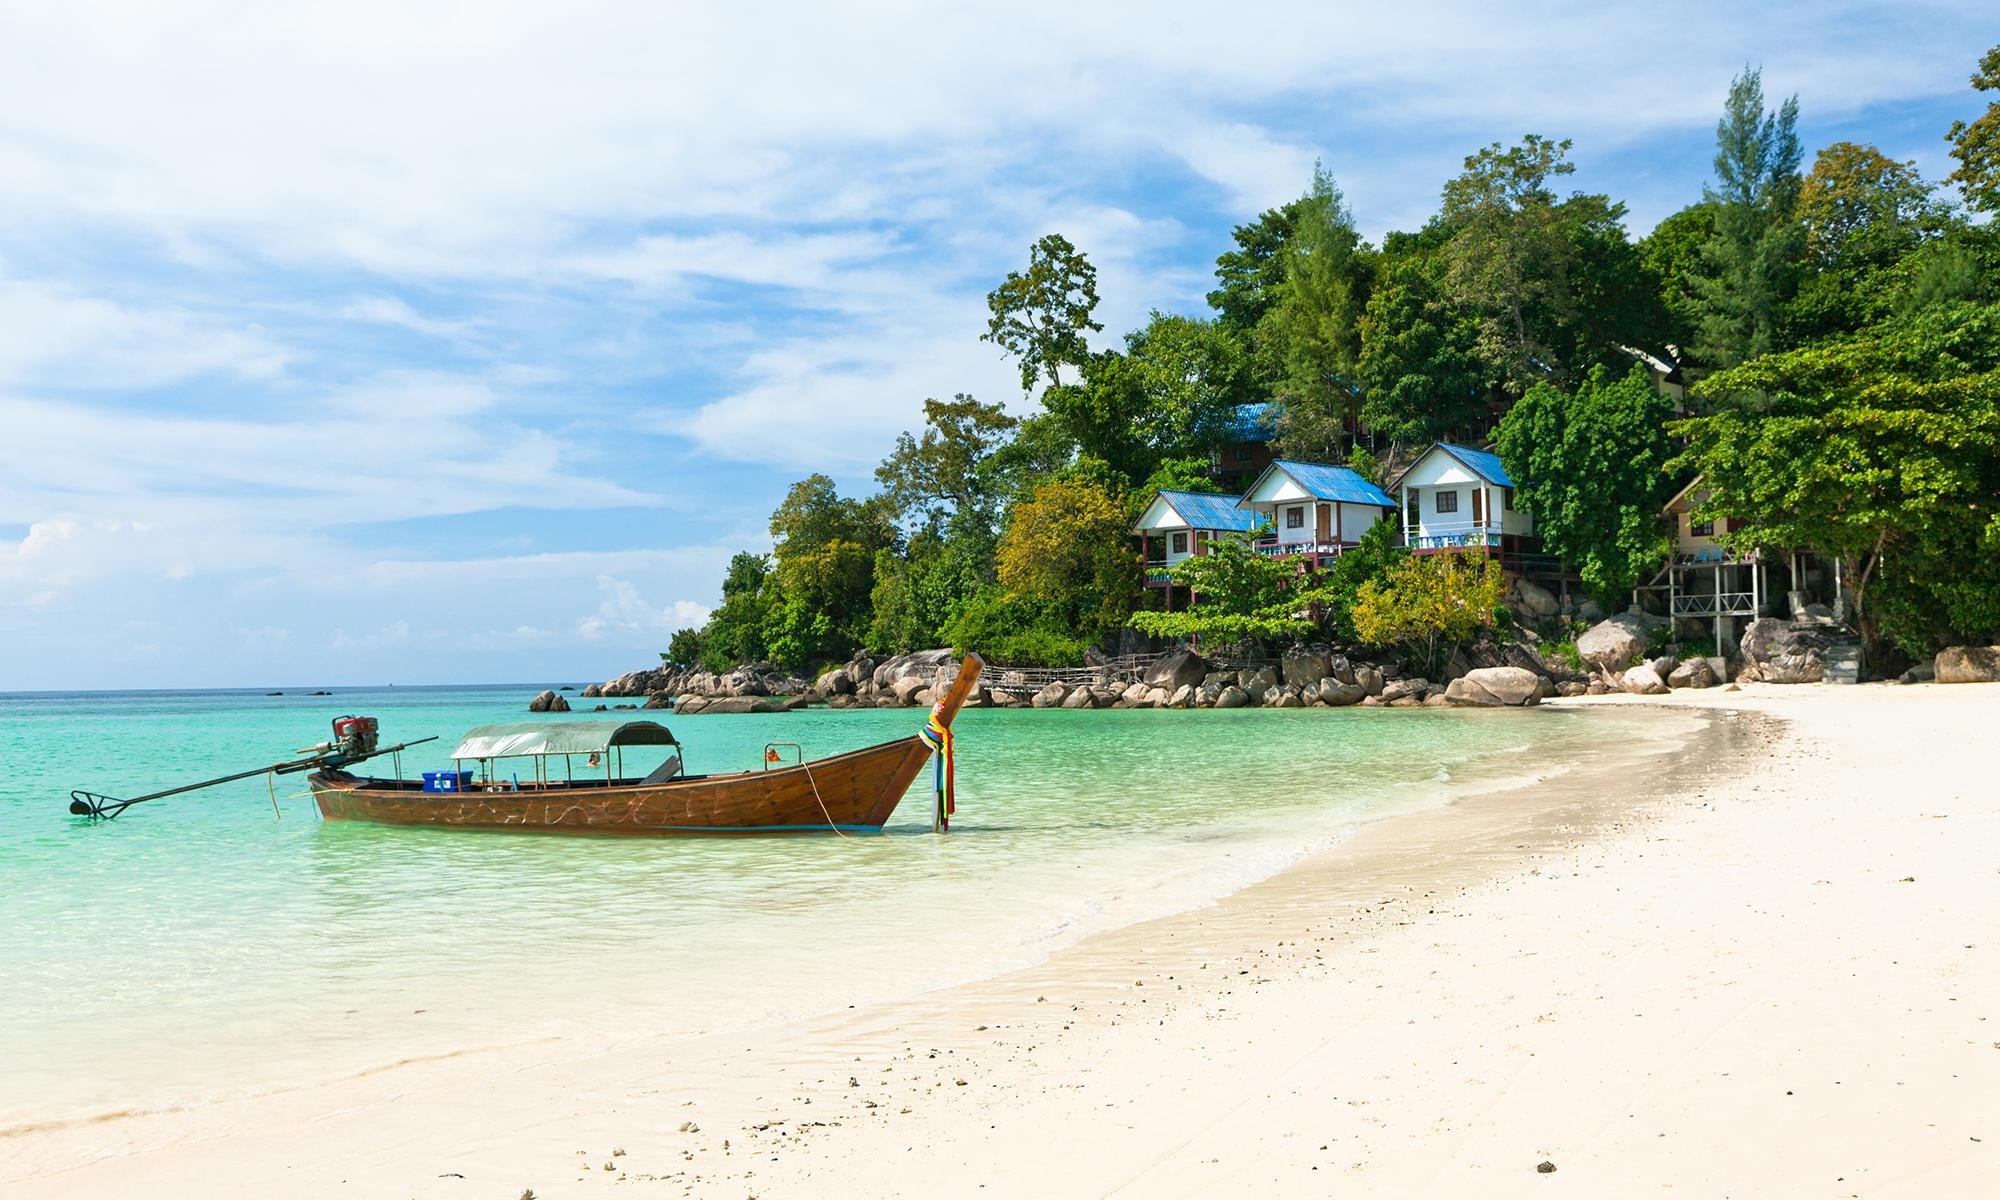 The hidden tropical paradise, Koh Lipe, Thailand